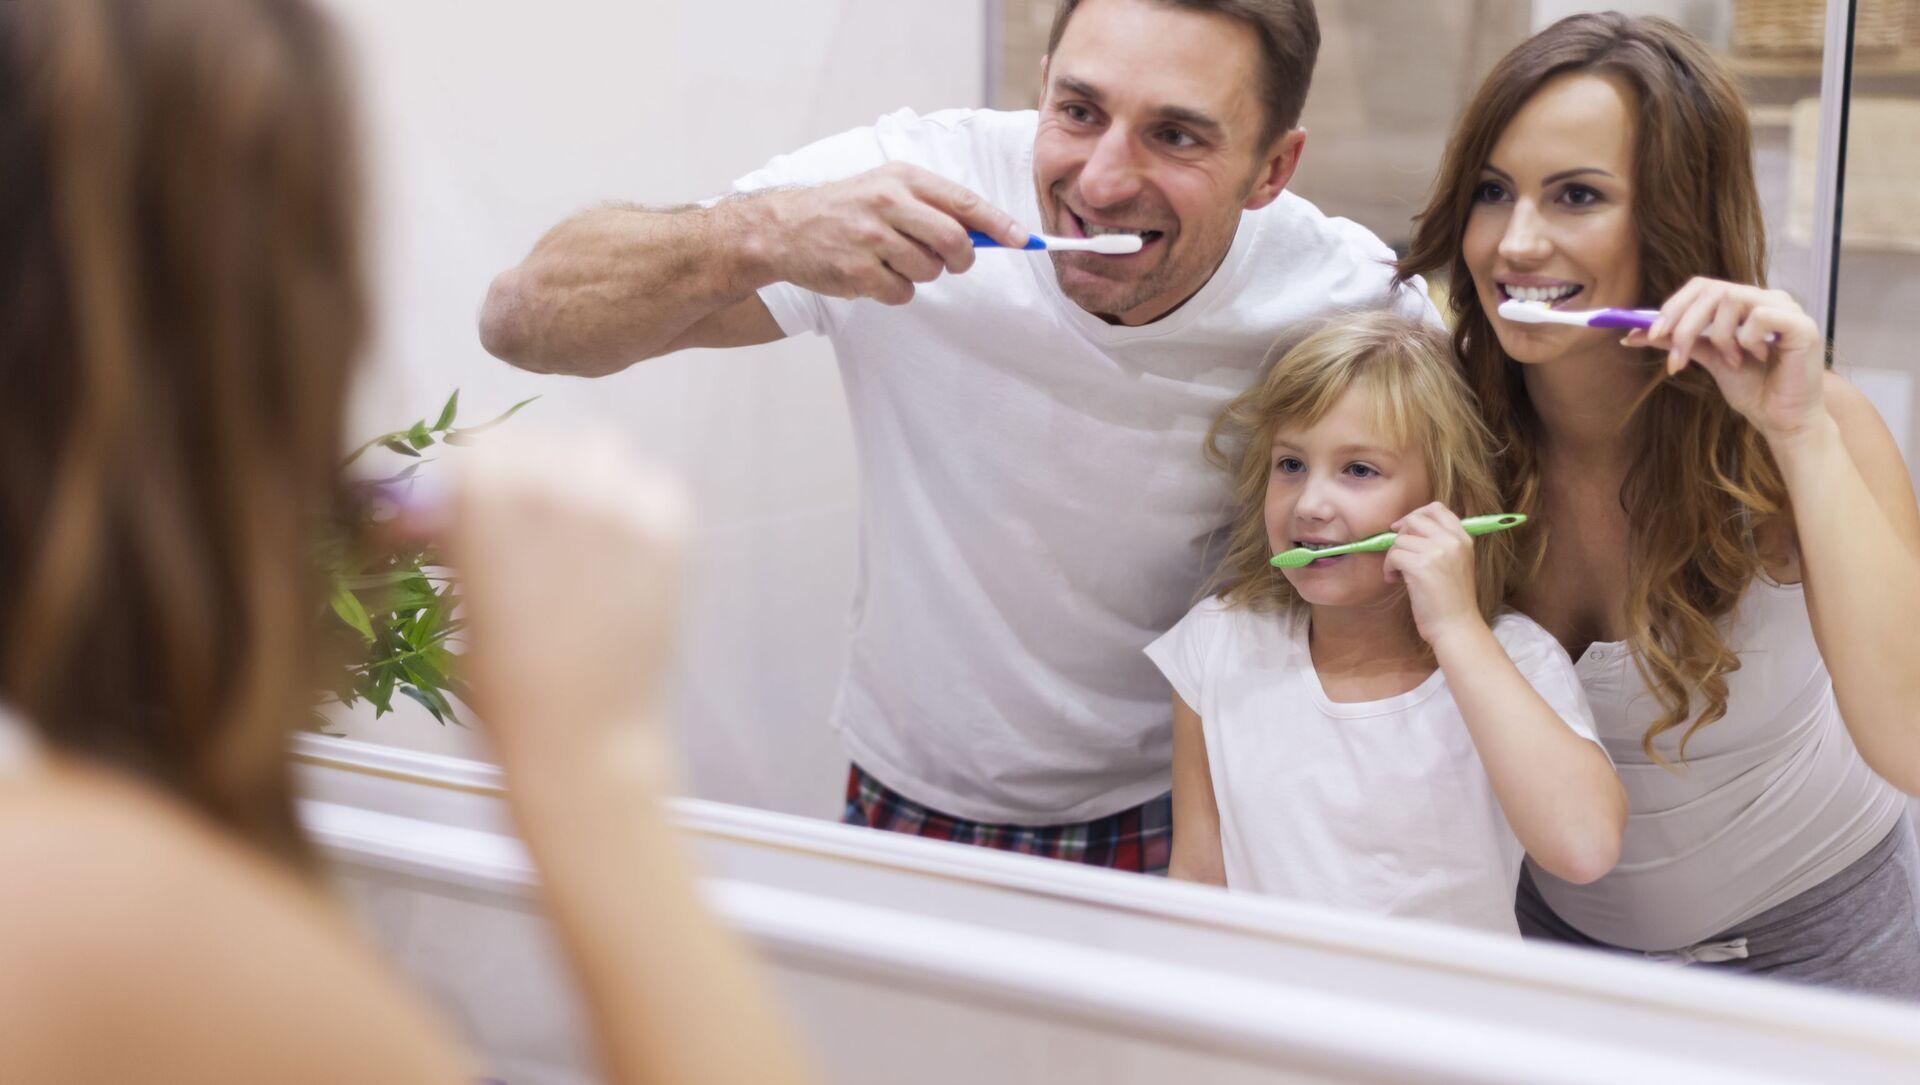 Una famiglia si lava i denti - Sputnik Italia, 1920, 15.02.2021